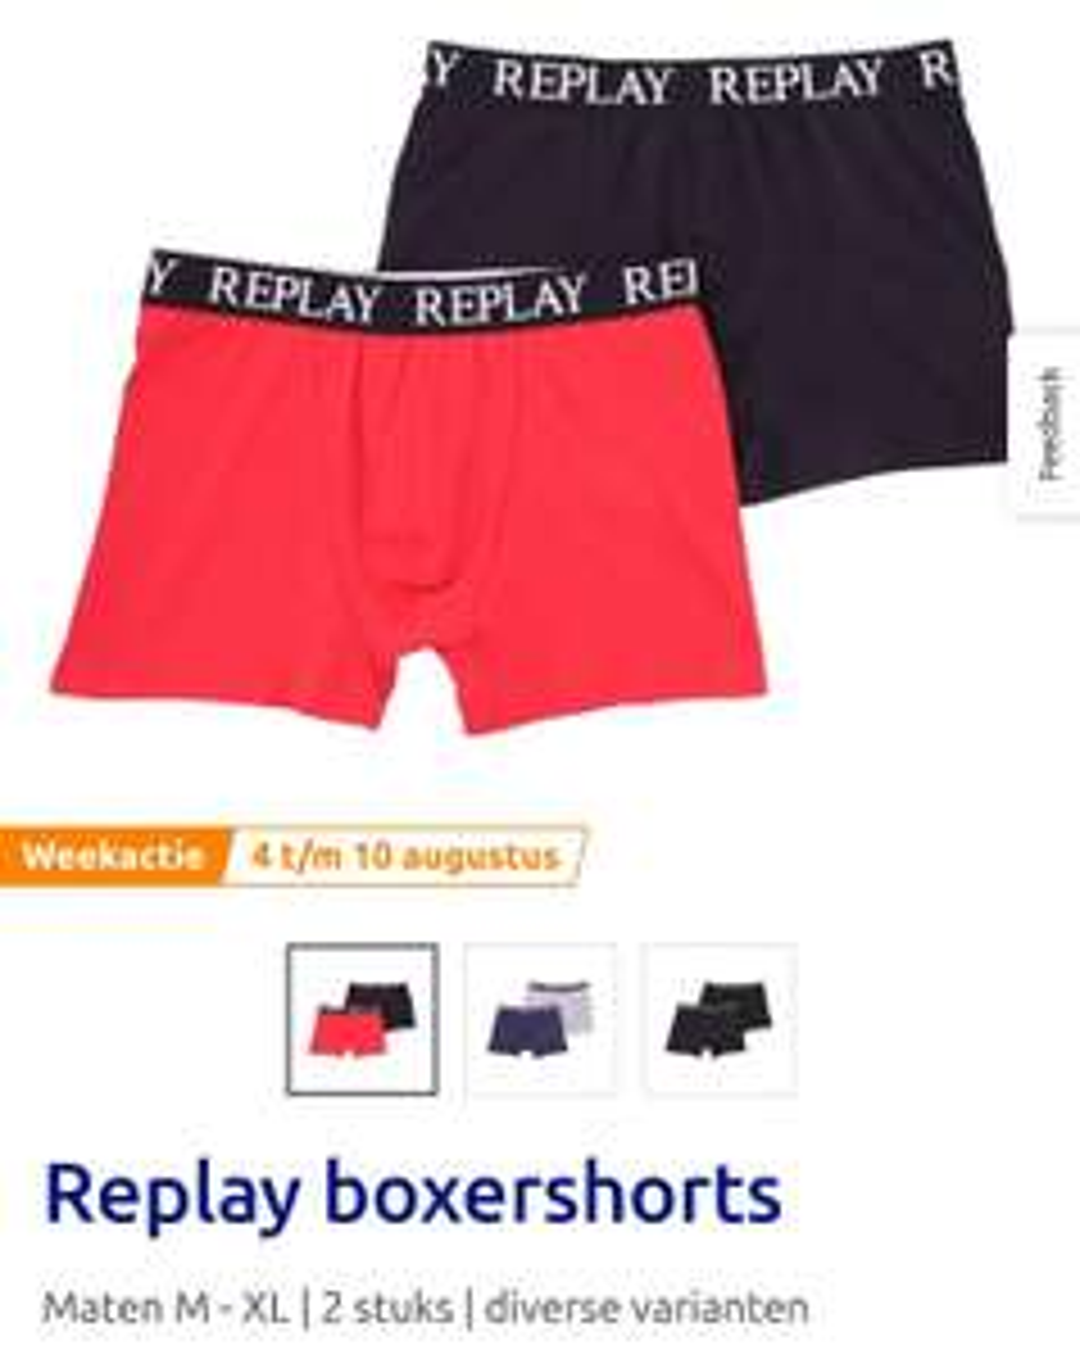 Action weekaanbieding Replay boxershorts 2 pack 9.98